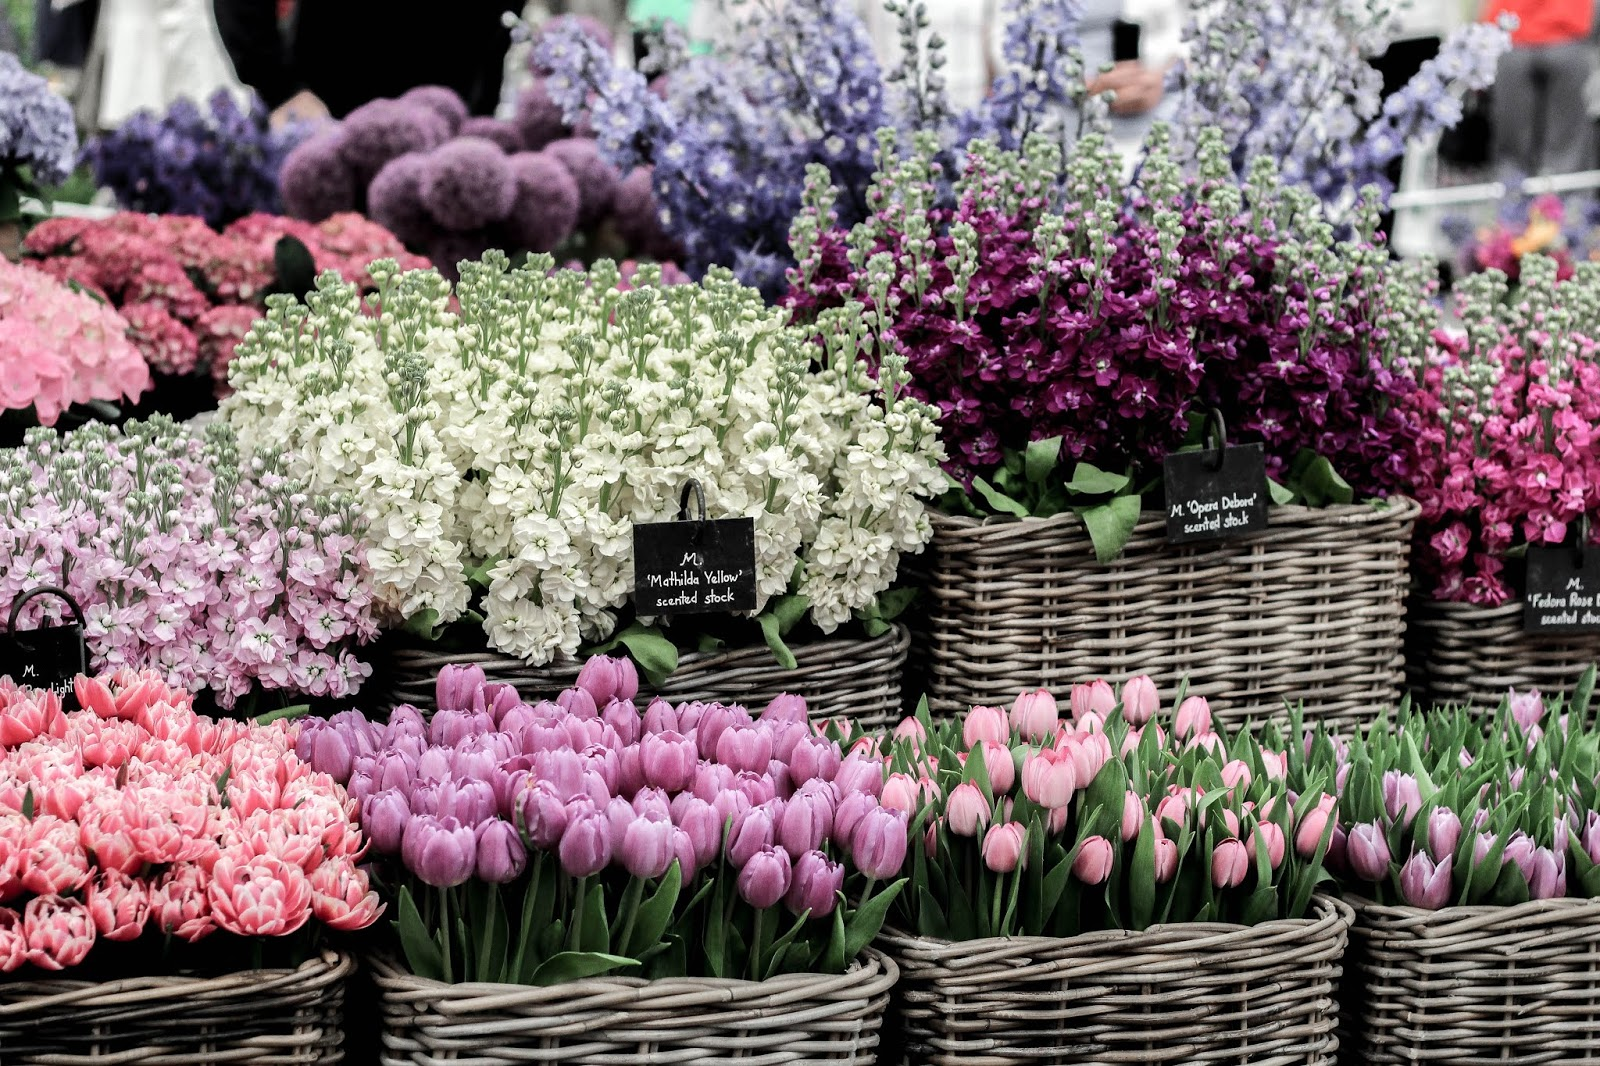 M&S Floral Market at Chelsea Flower Show 2018